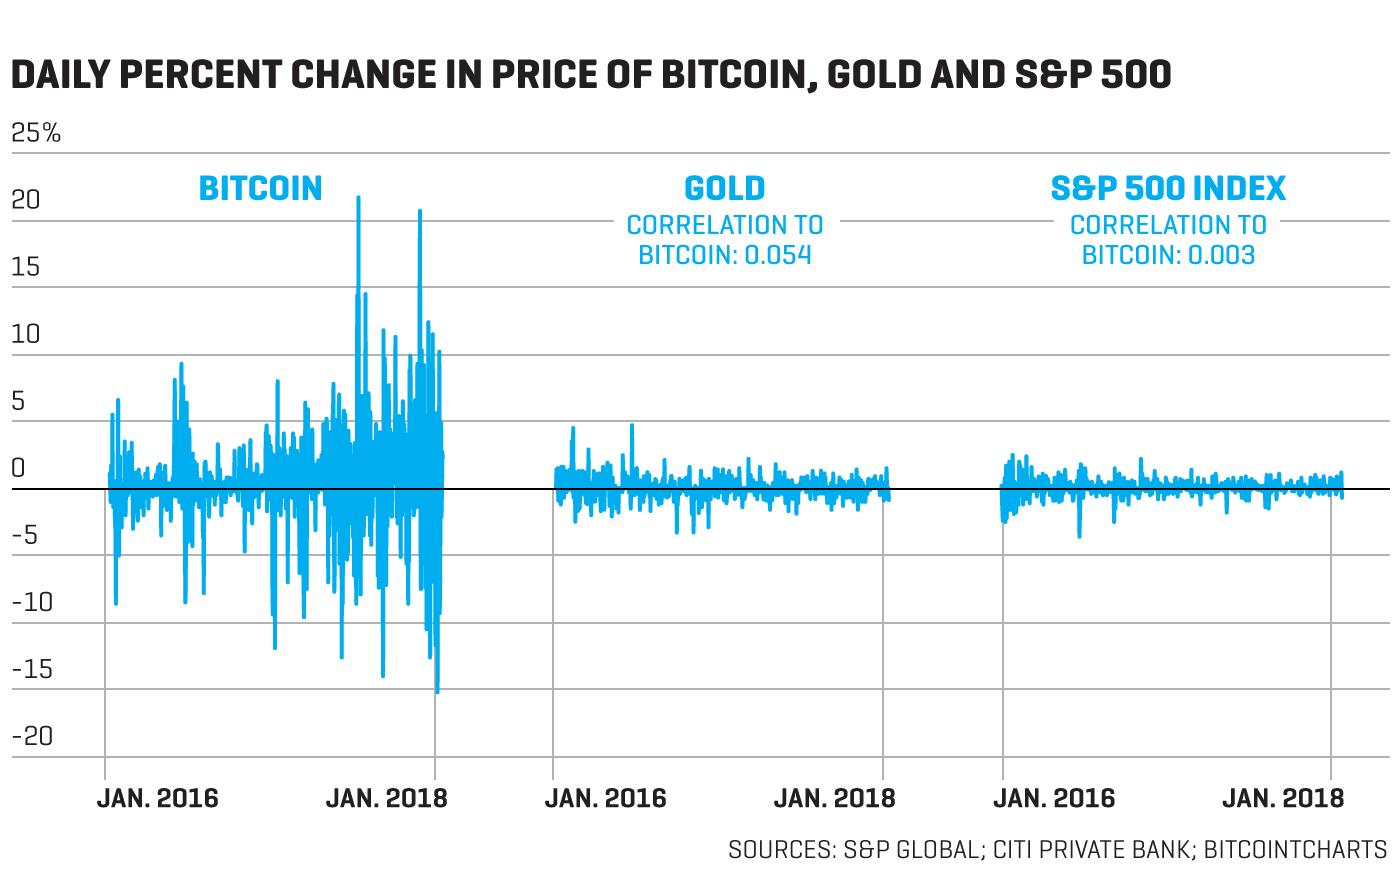 Bitcoin Volatility Less than Stocks' 'VIX' Index, SEC Says